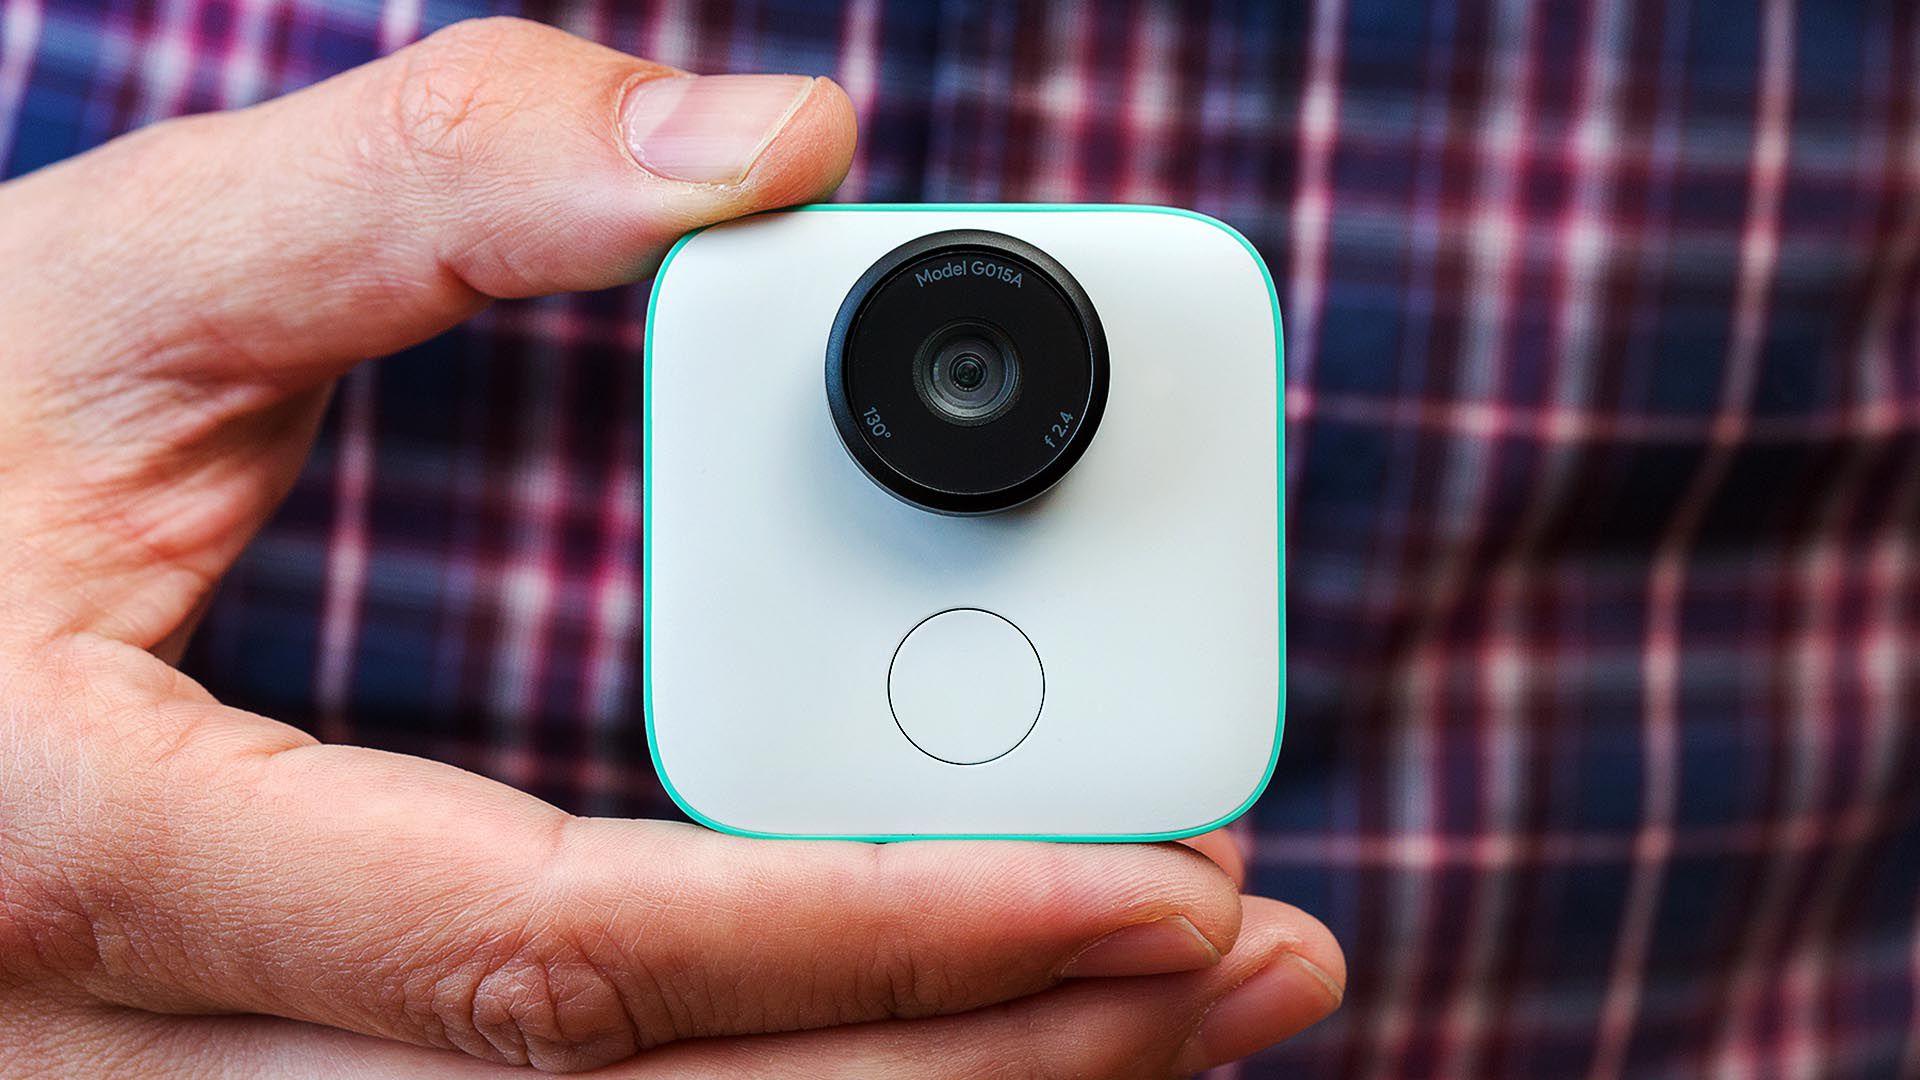 Google Clips AI-Based Camera